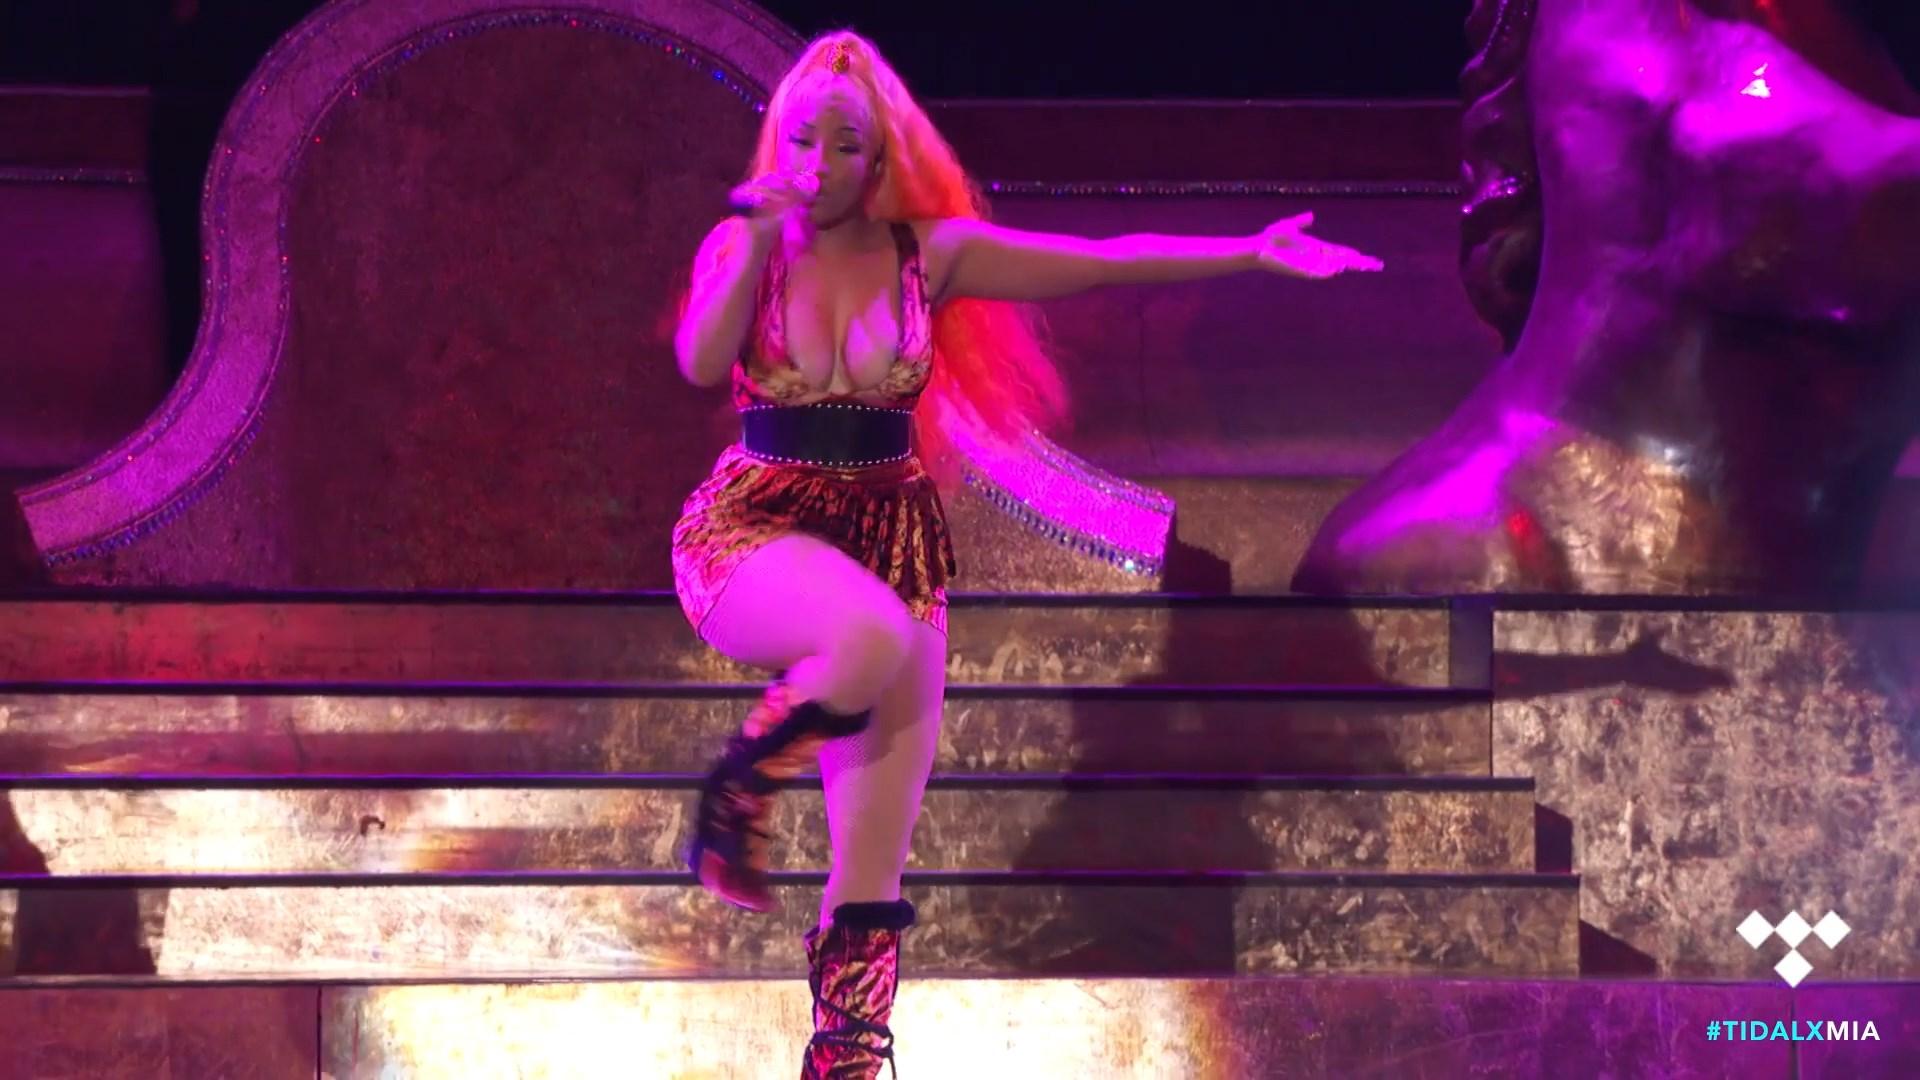 Nicki-Minaj-Nude-TheFappeningBlog.com-14.jpg